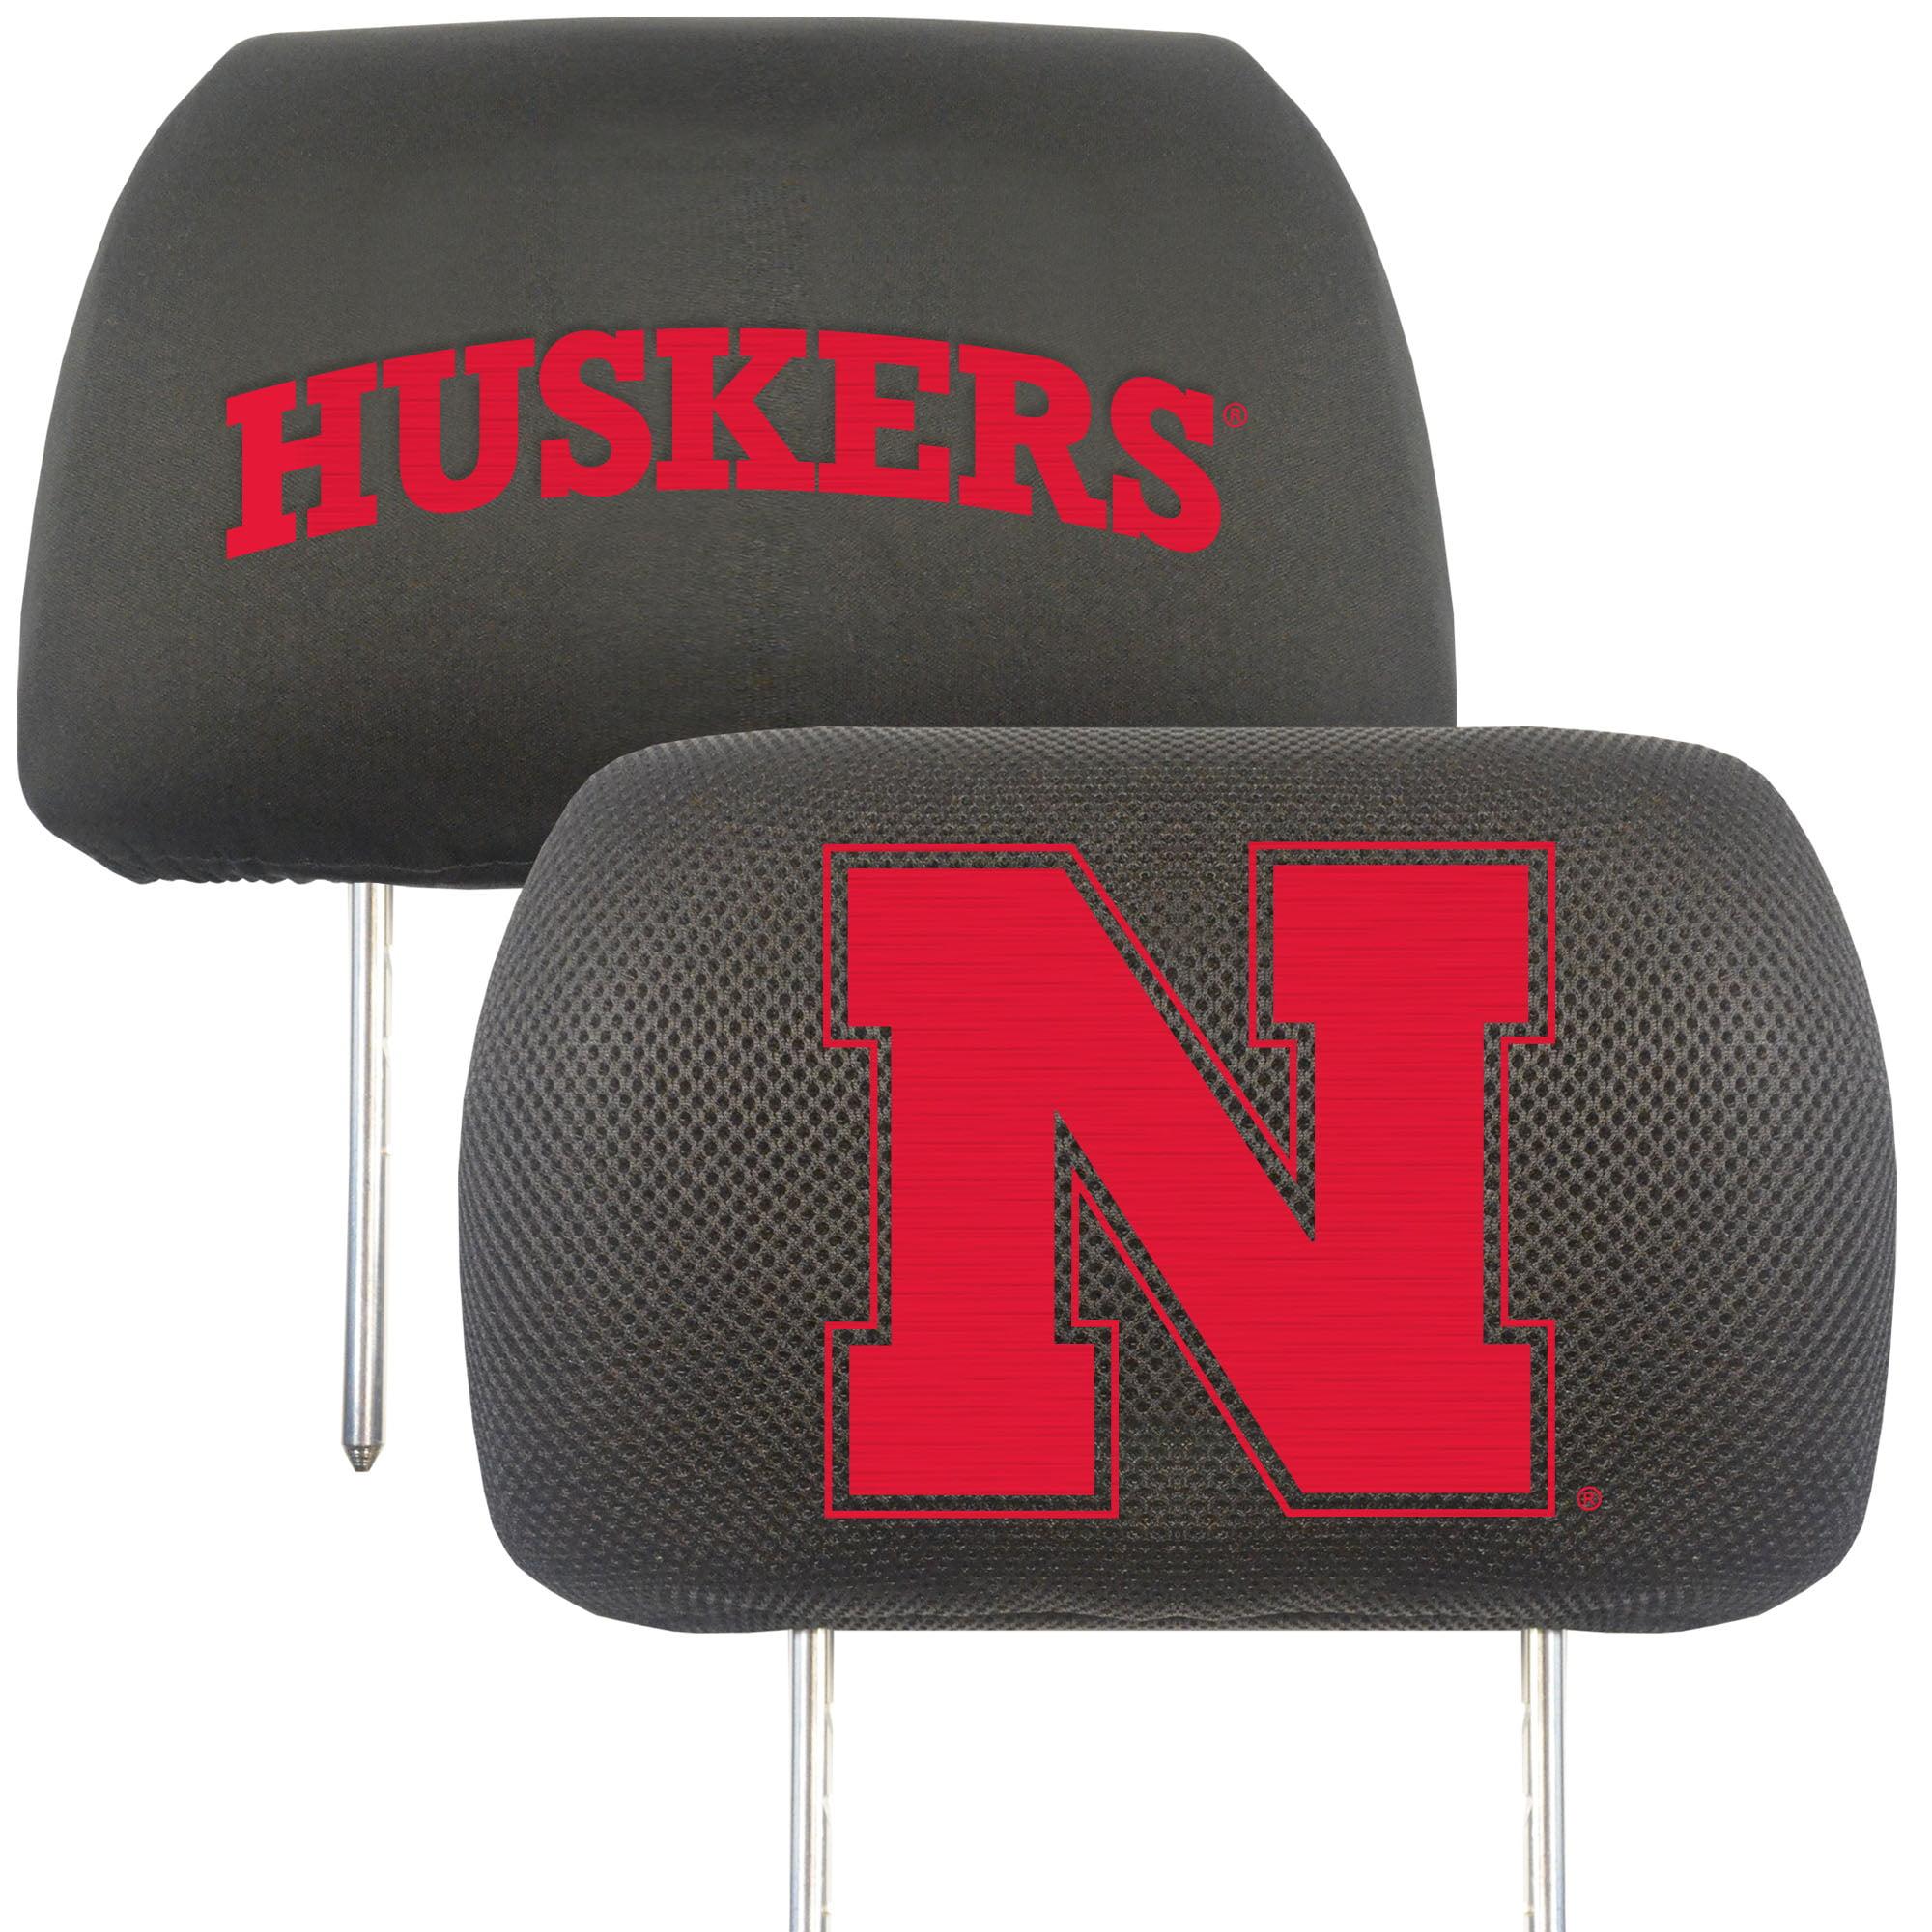 NCAA University of Nebraska - Blackshirts Cornhuskers Head Rest Cover Automotive Accessory